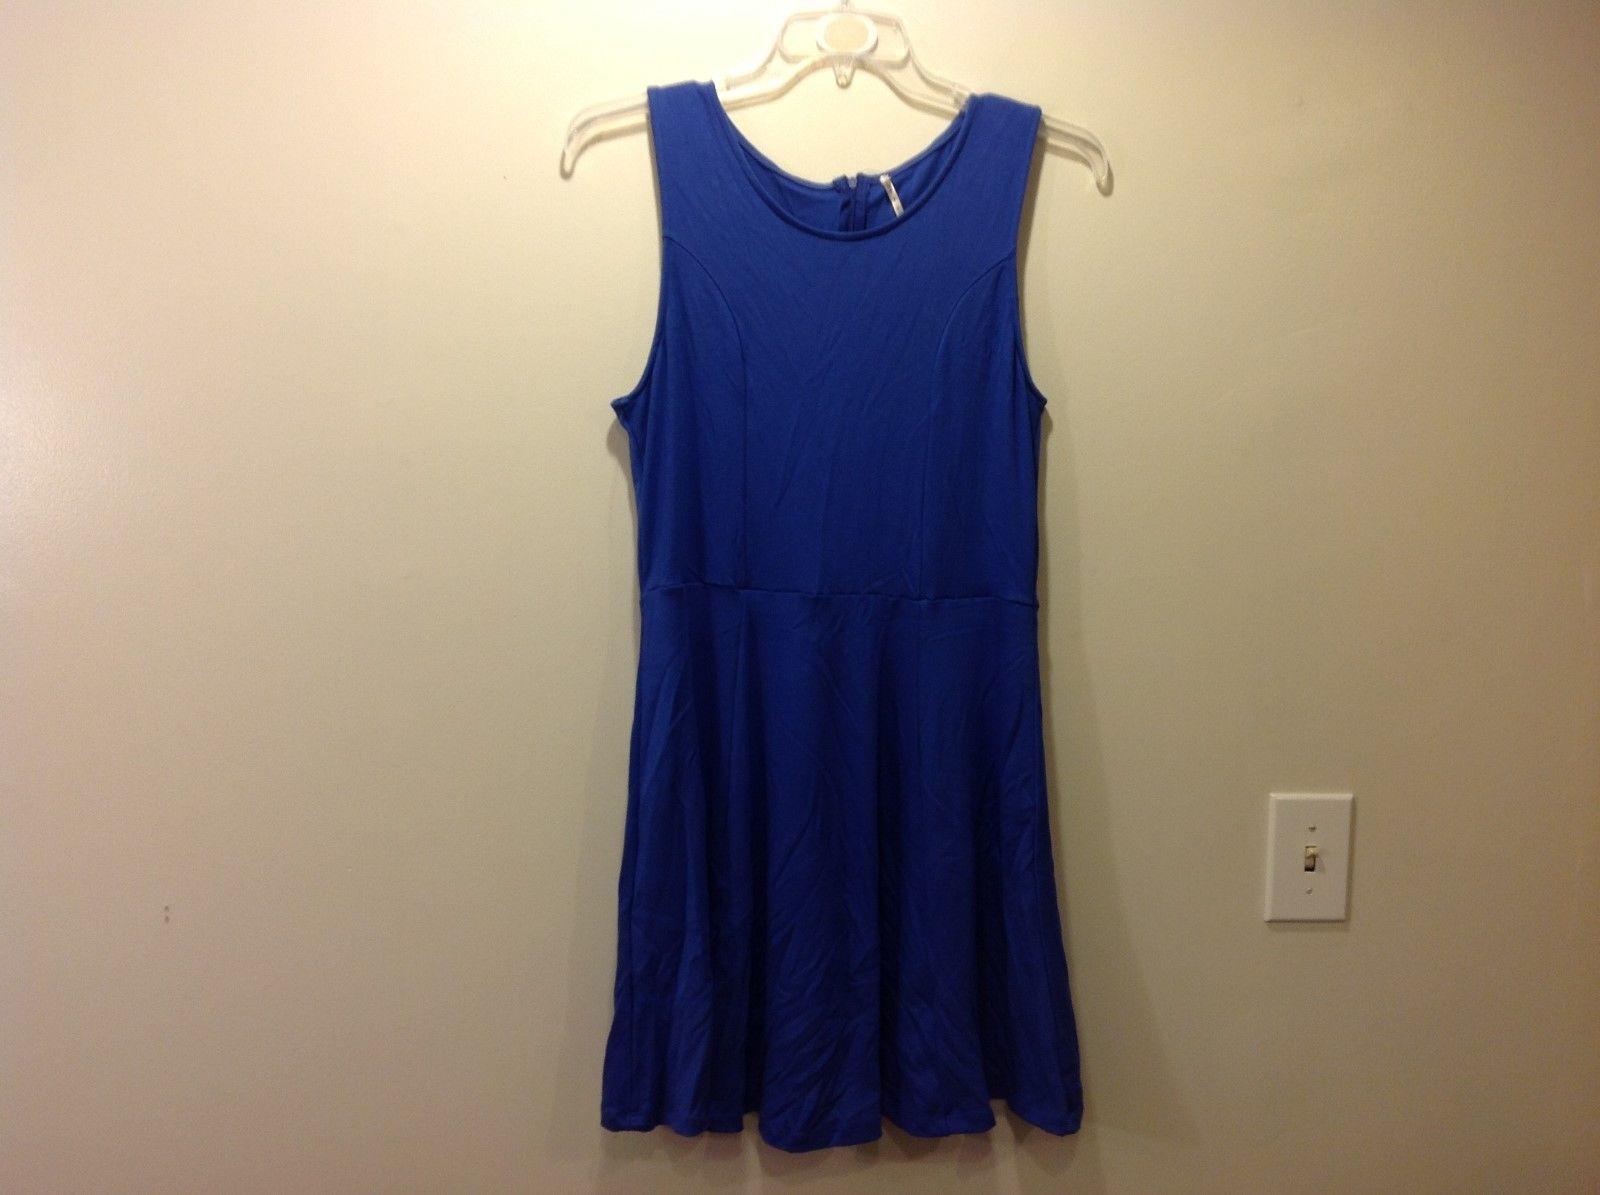 Ladies Flexible Blue Sleeveless Dress w Zip Back Sz M